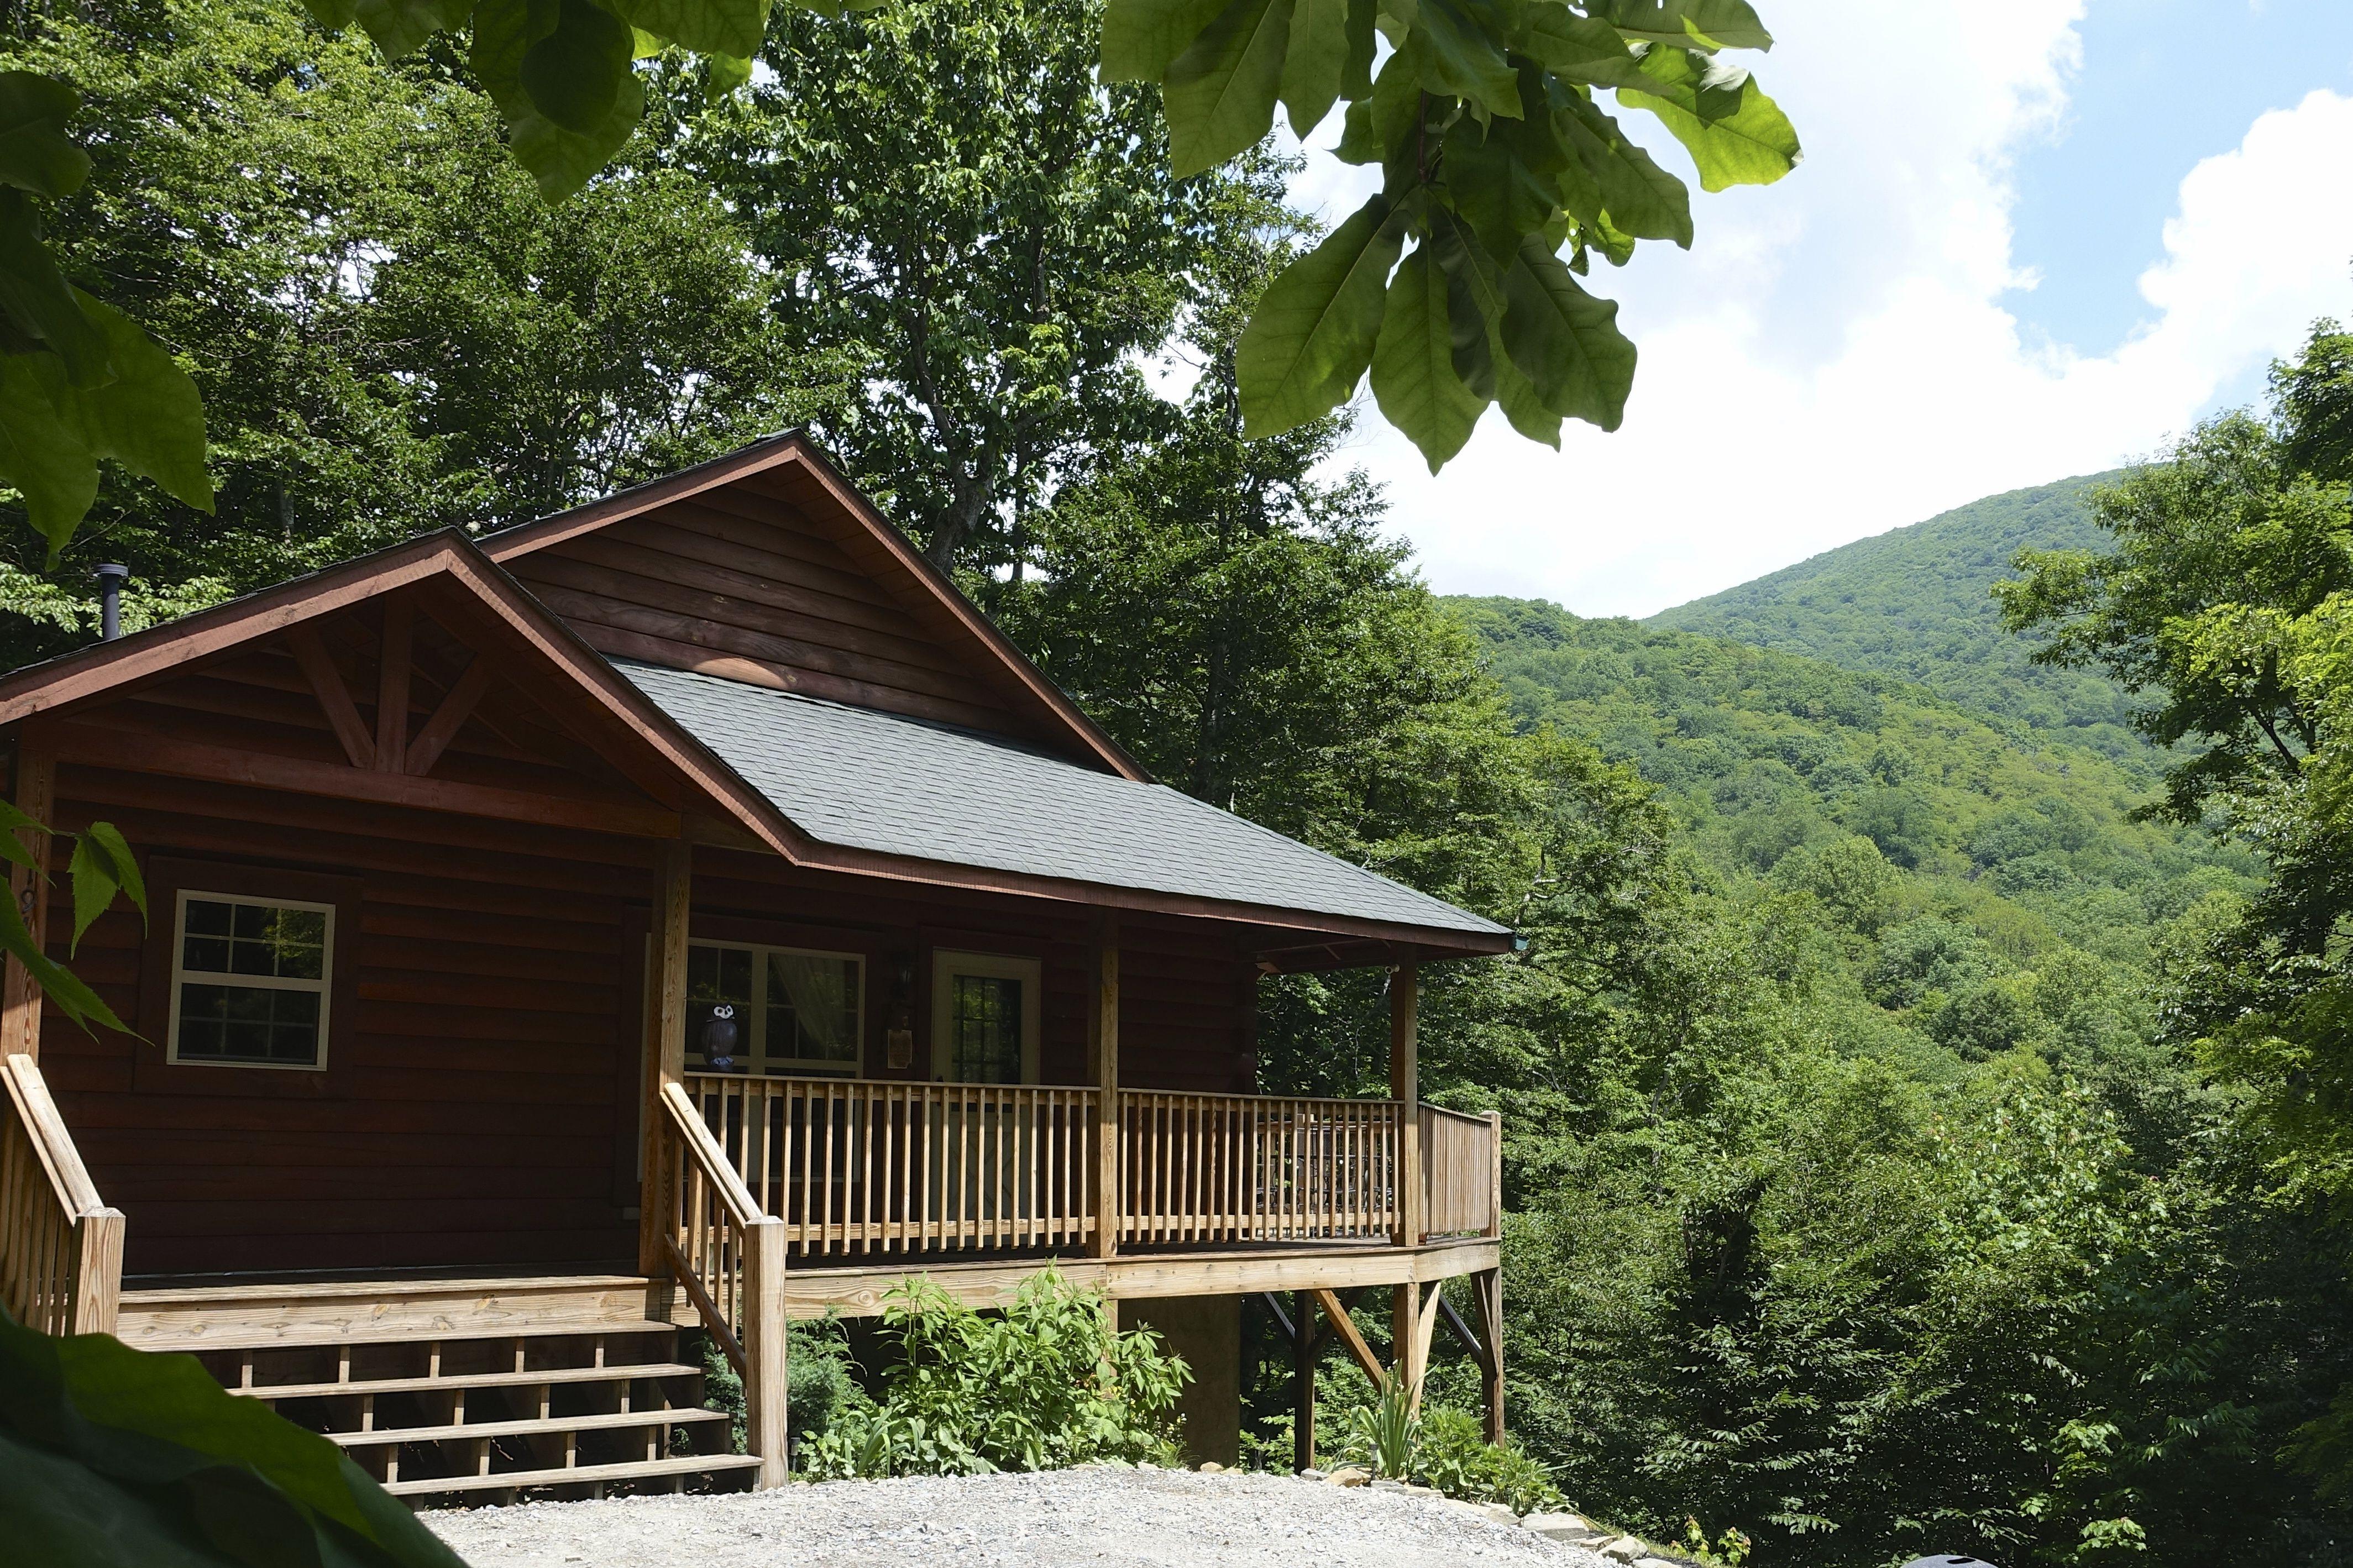 near knob this vacation rentals carolina boone cabin book cabins l image nc elk